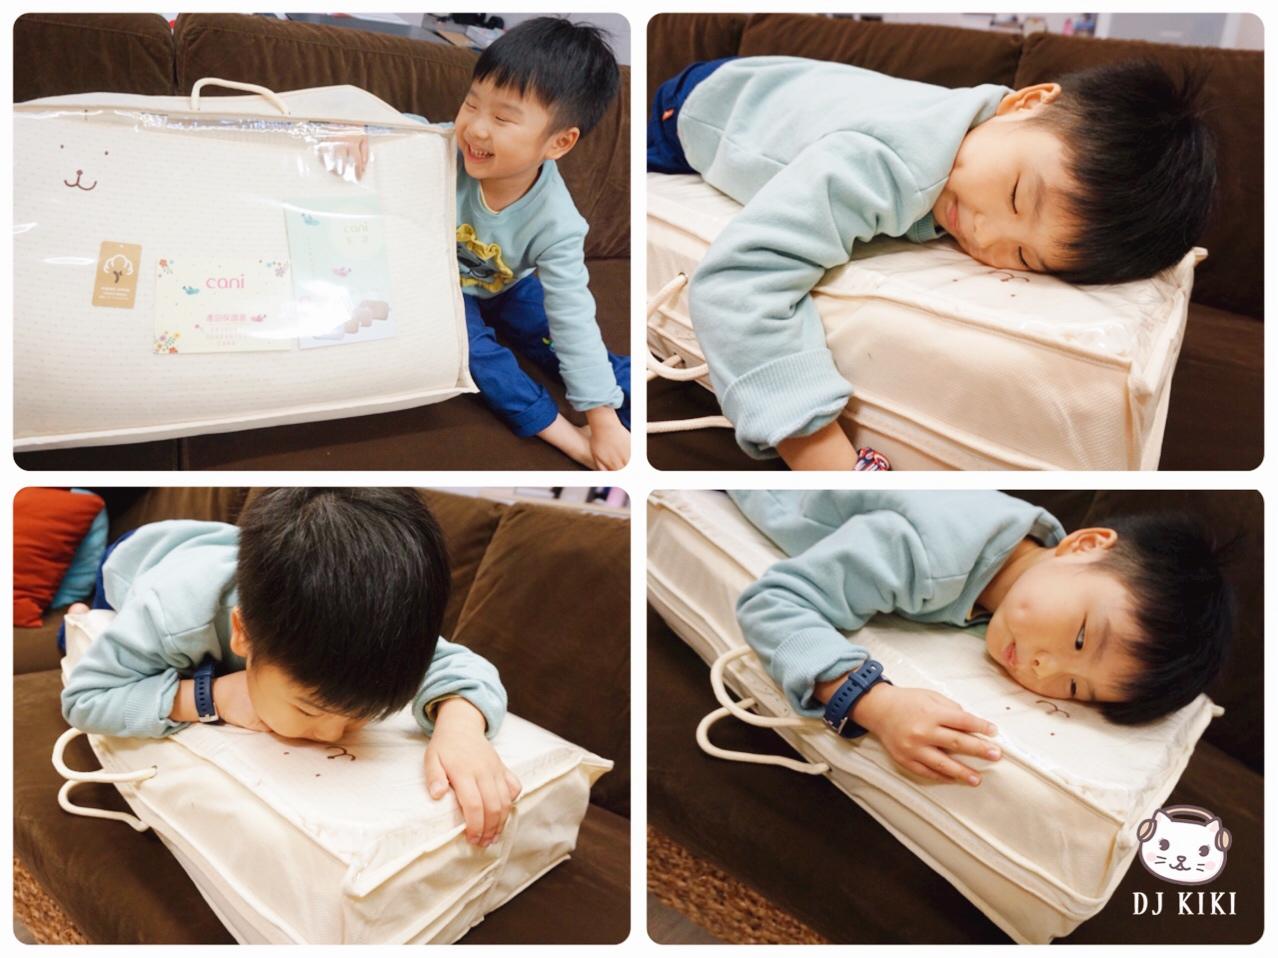 IMG_7724-改善寶寶睡眠,營造能透氣的親子關係-Cani Airwave